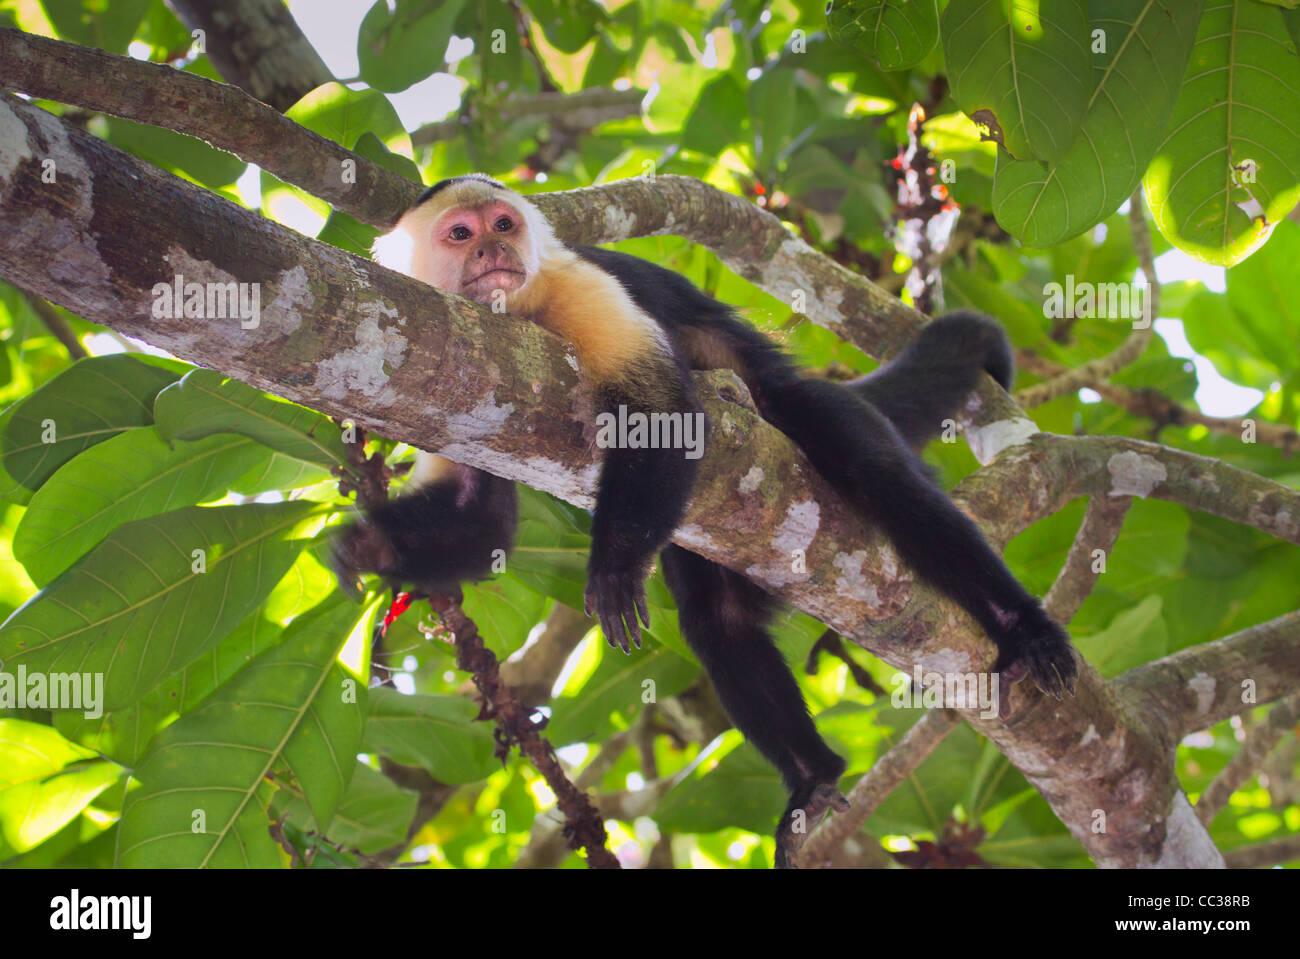 white-headed capuchin (Cebus capucinus) taking rest in a tree Stock Photo